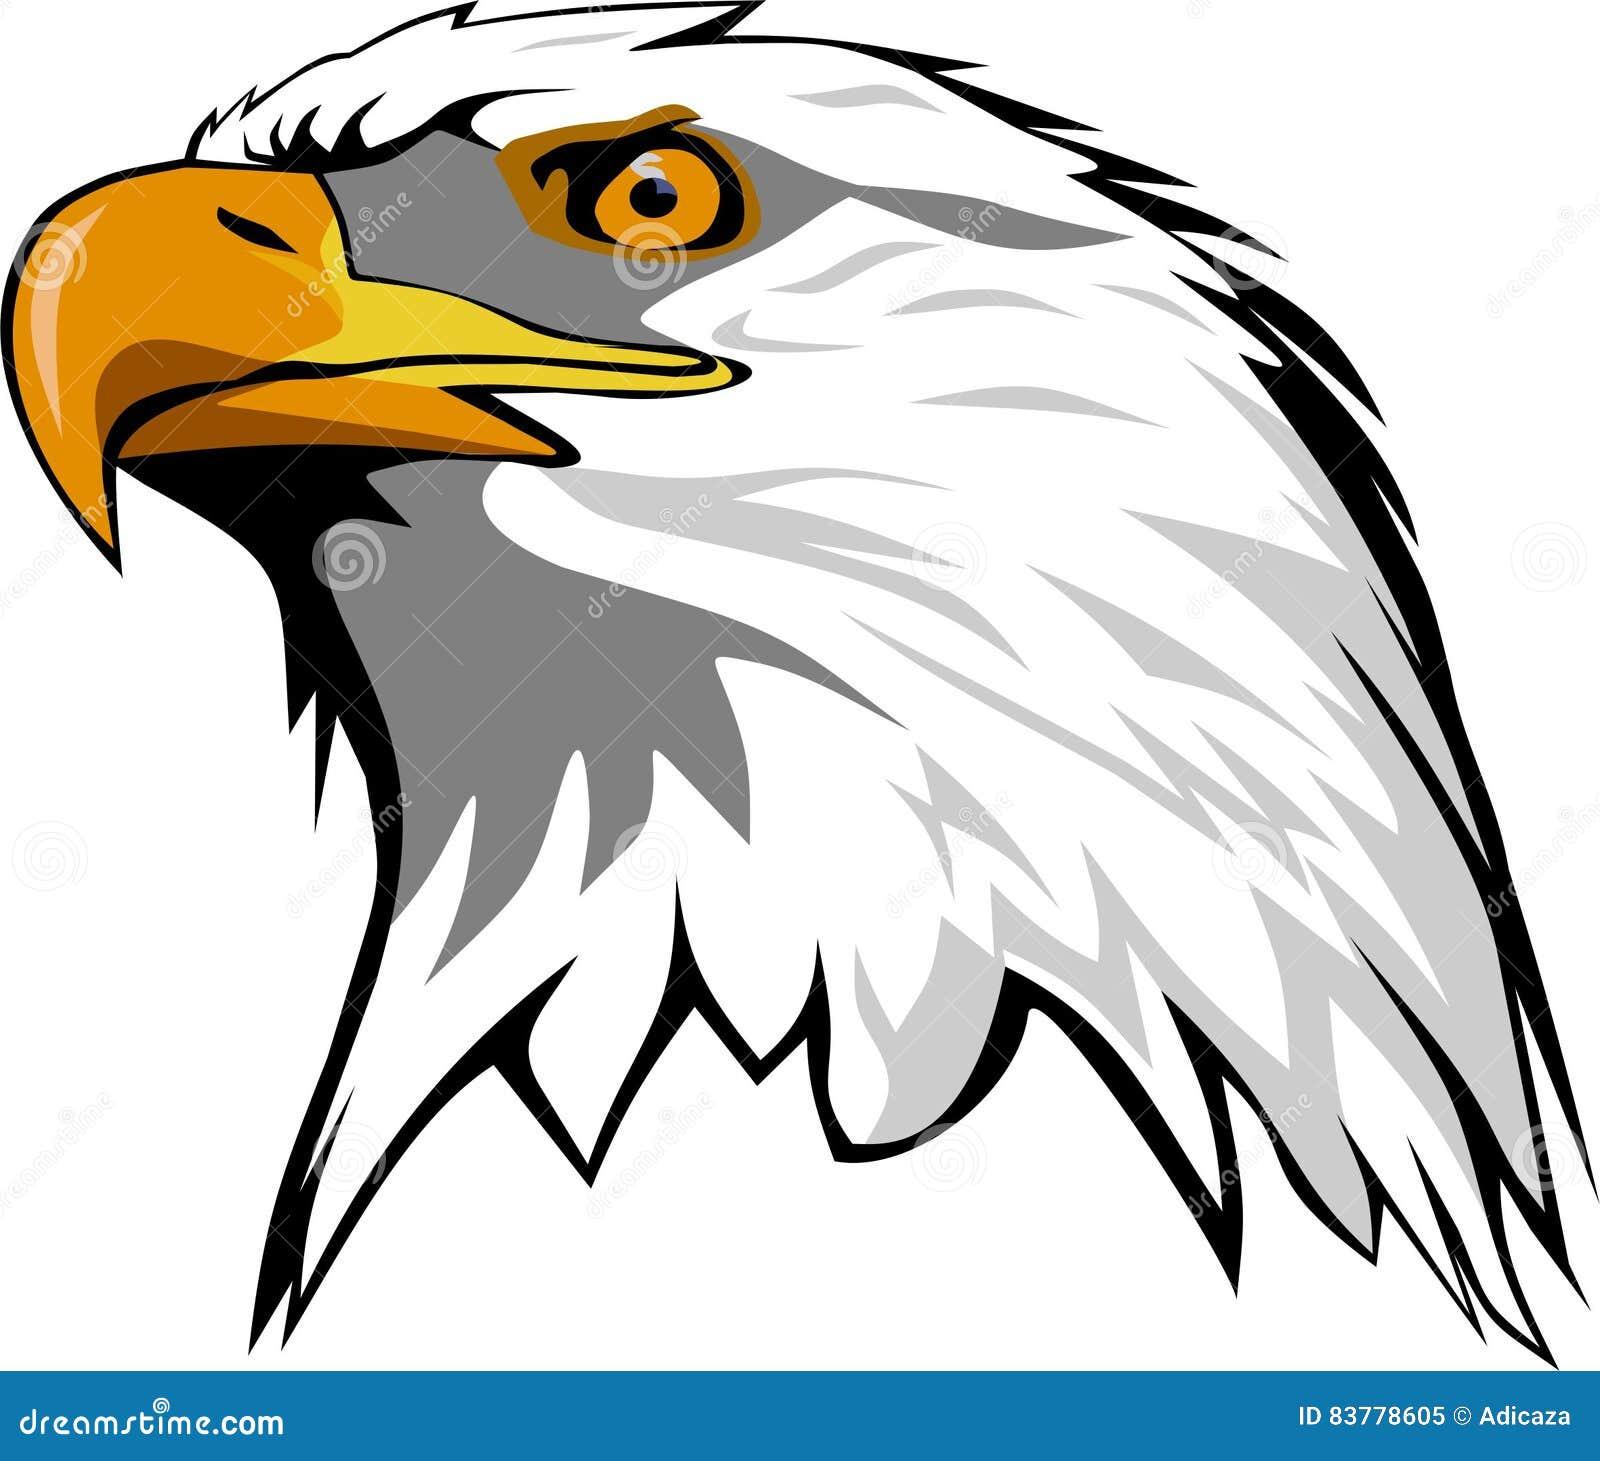 Eagle Head Stock Vector. Illustration Of Predator, Lineart